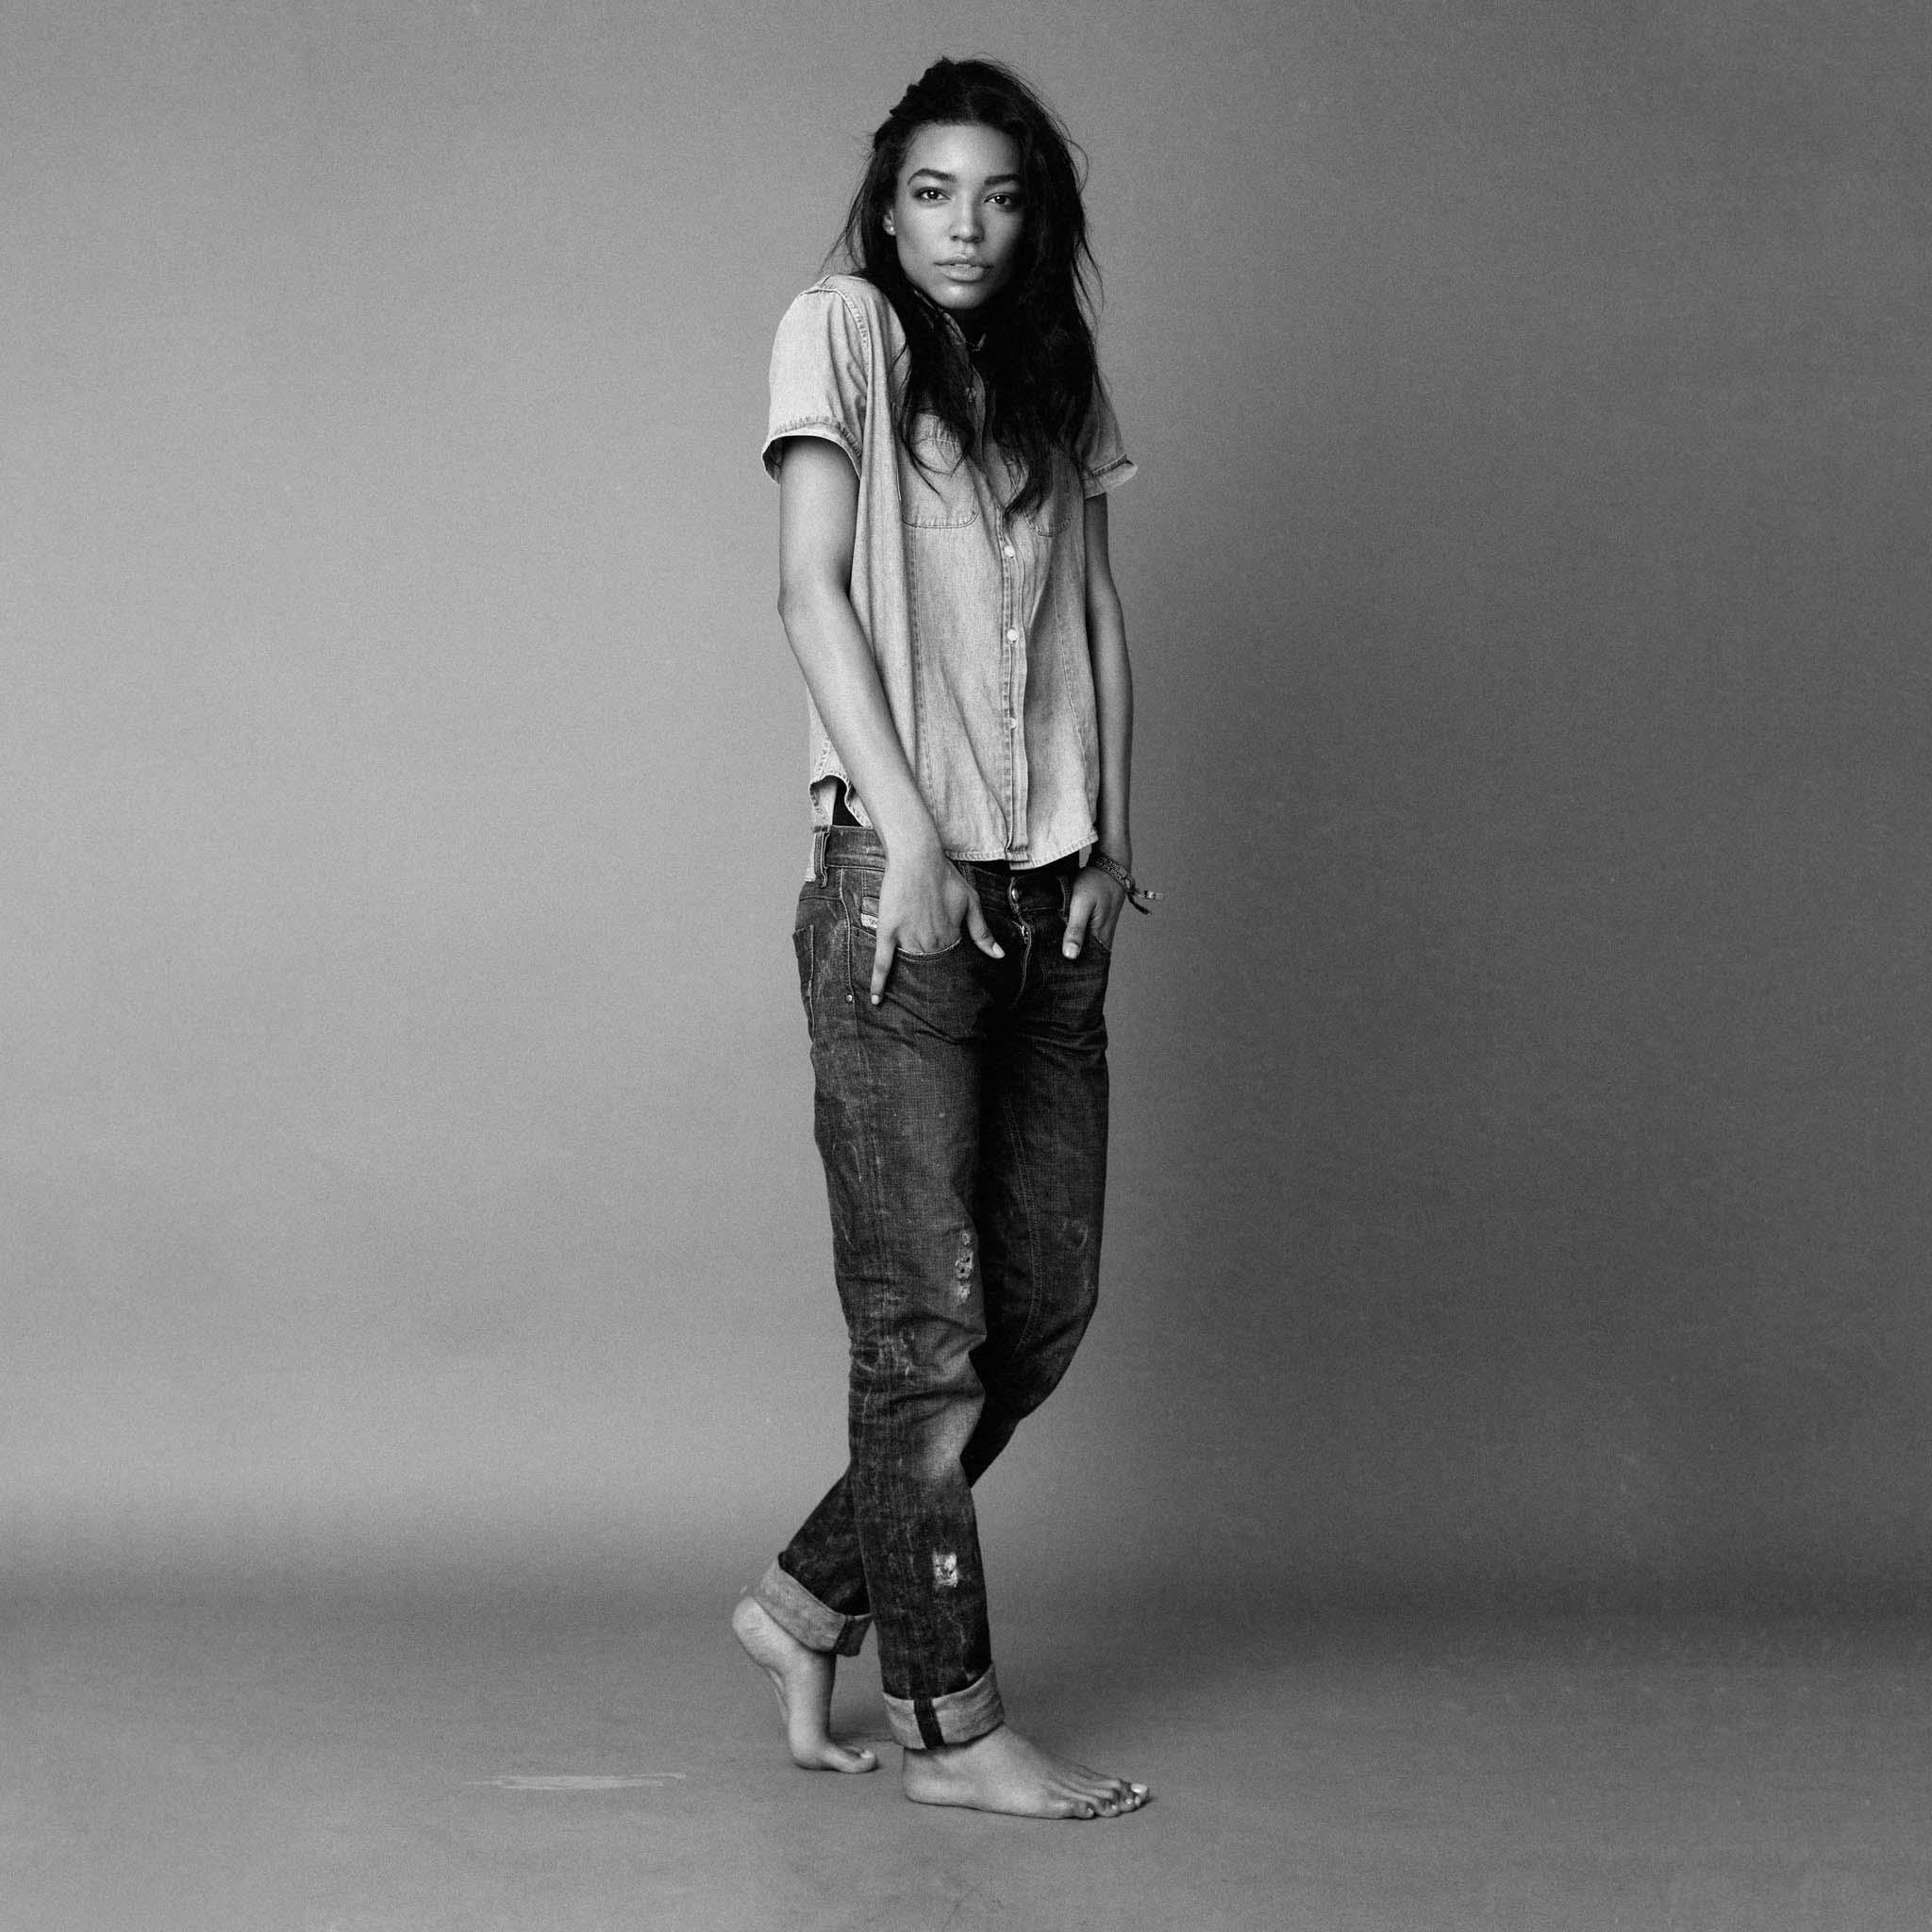 nyc-photographers-model-test-10002.jpg